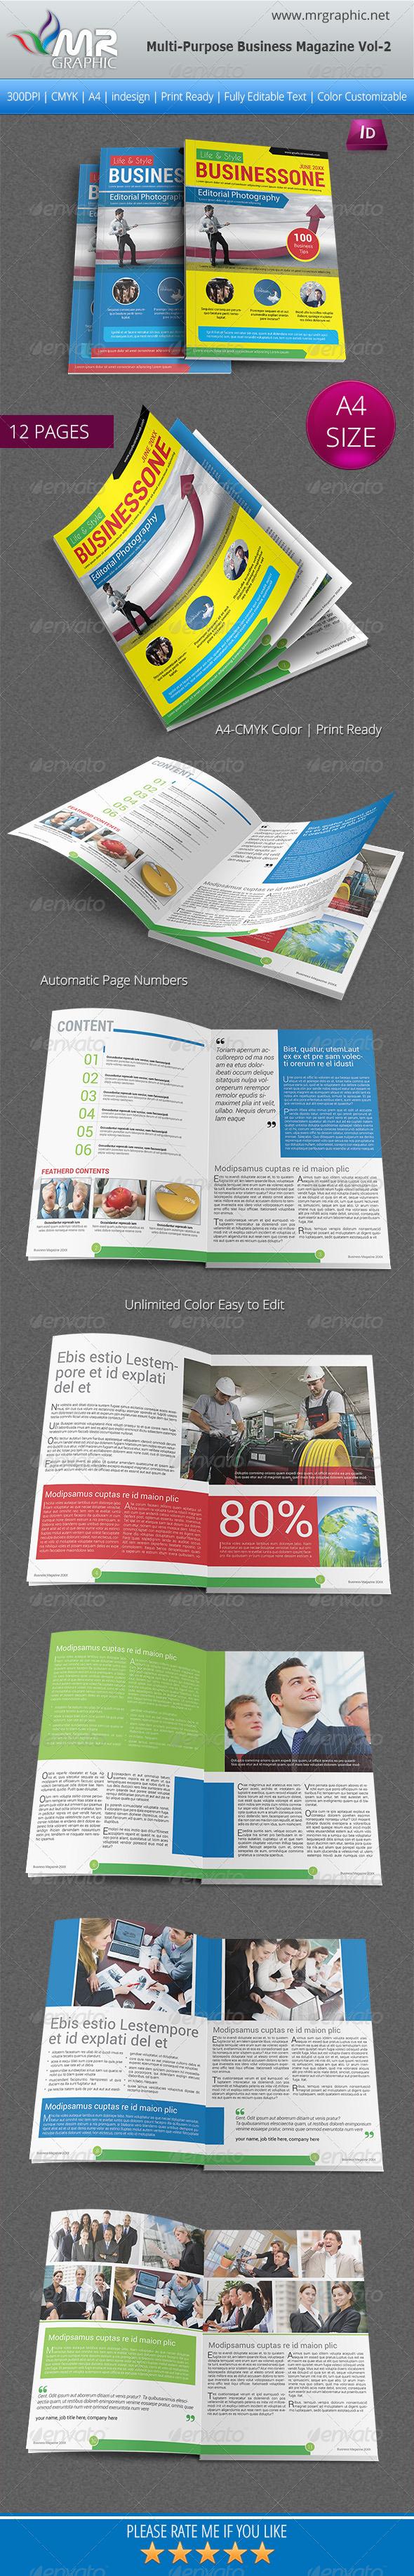 Multipurpose Business Magazine Vol-2 - Magazines Print Templates